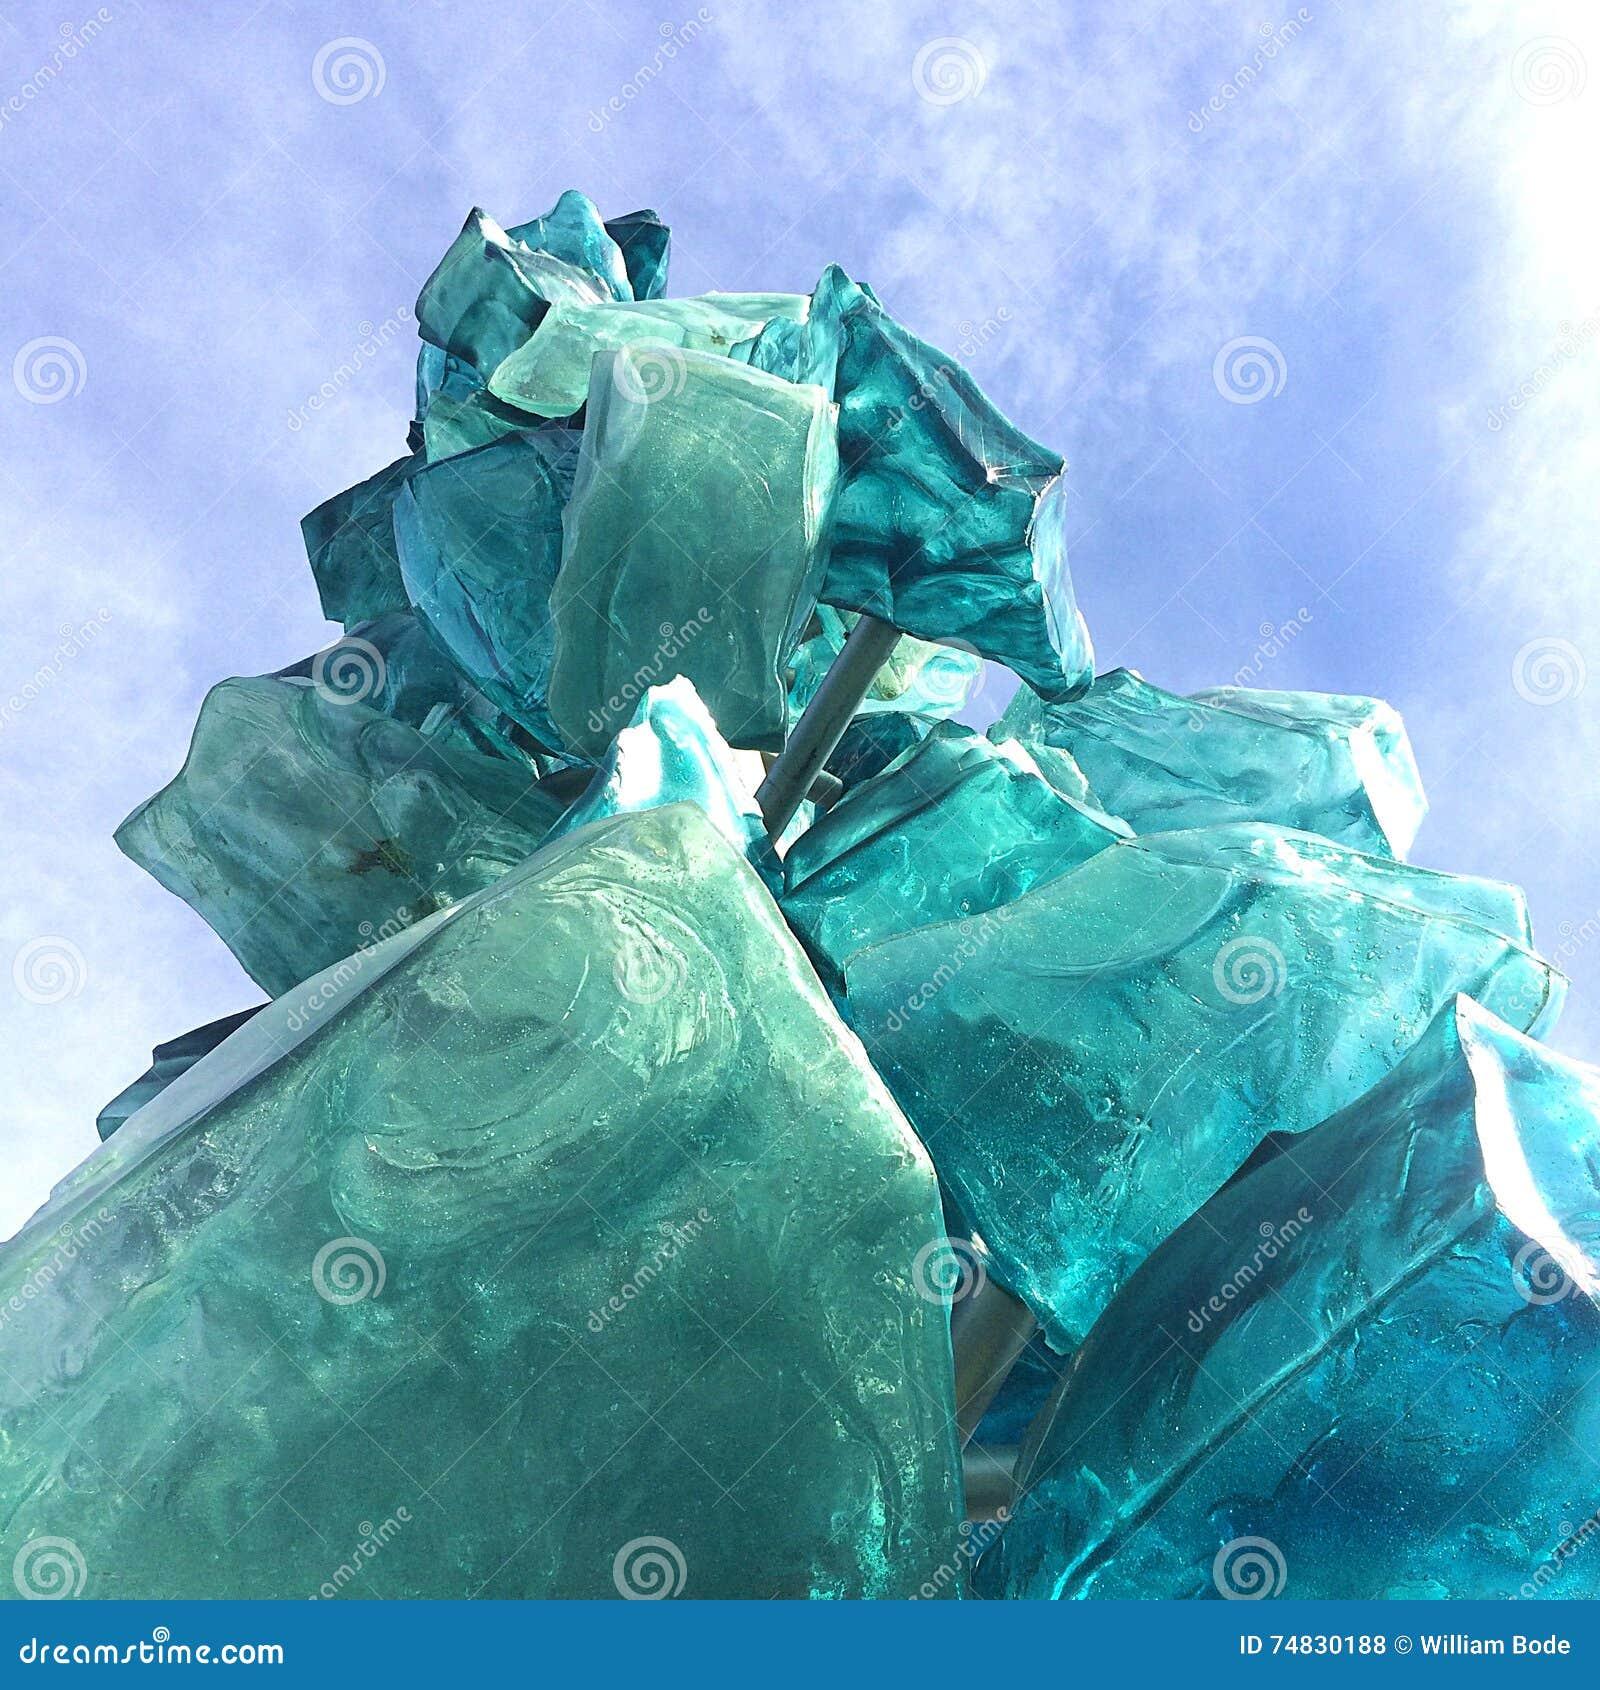 Escultura de hielo de cristal